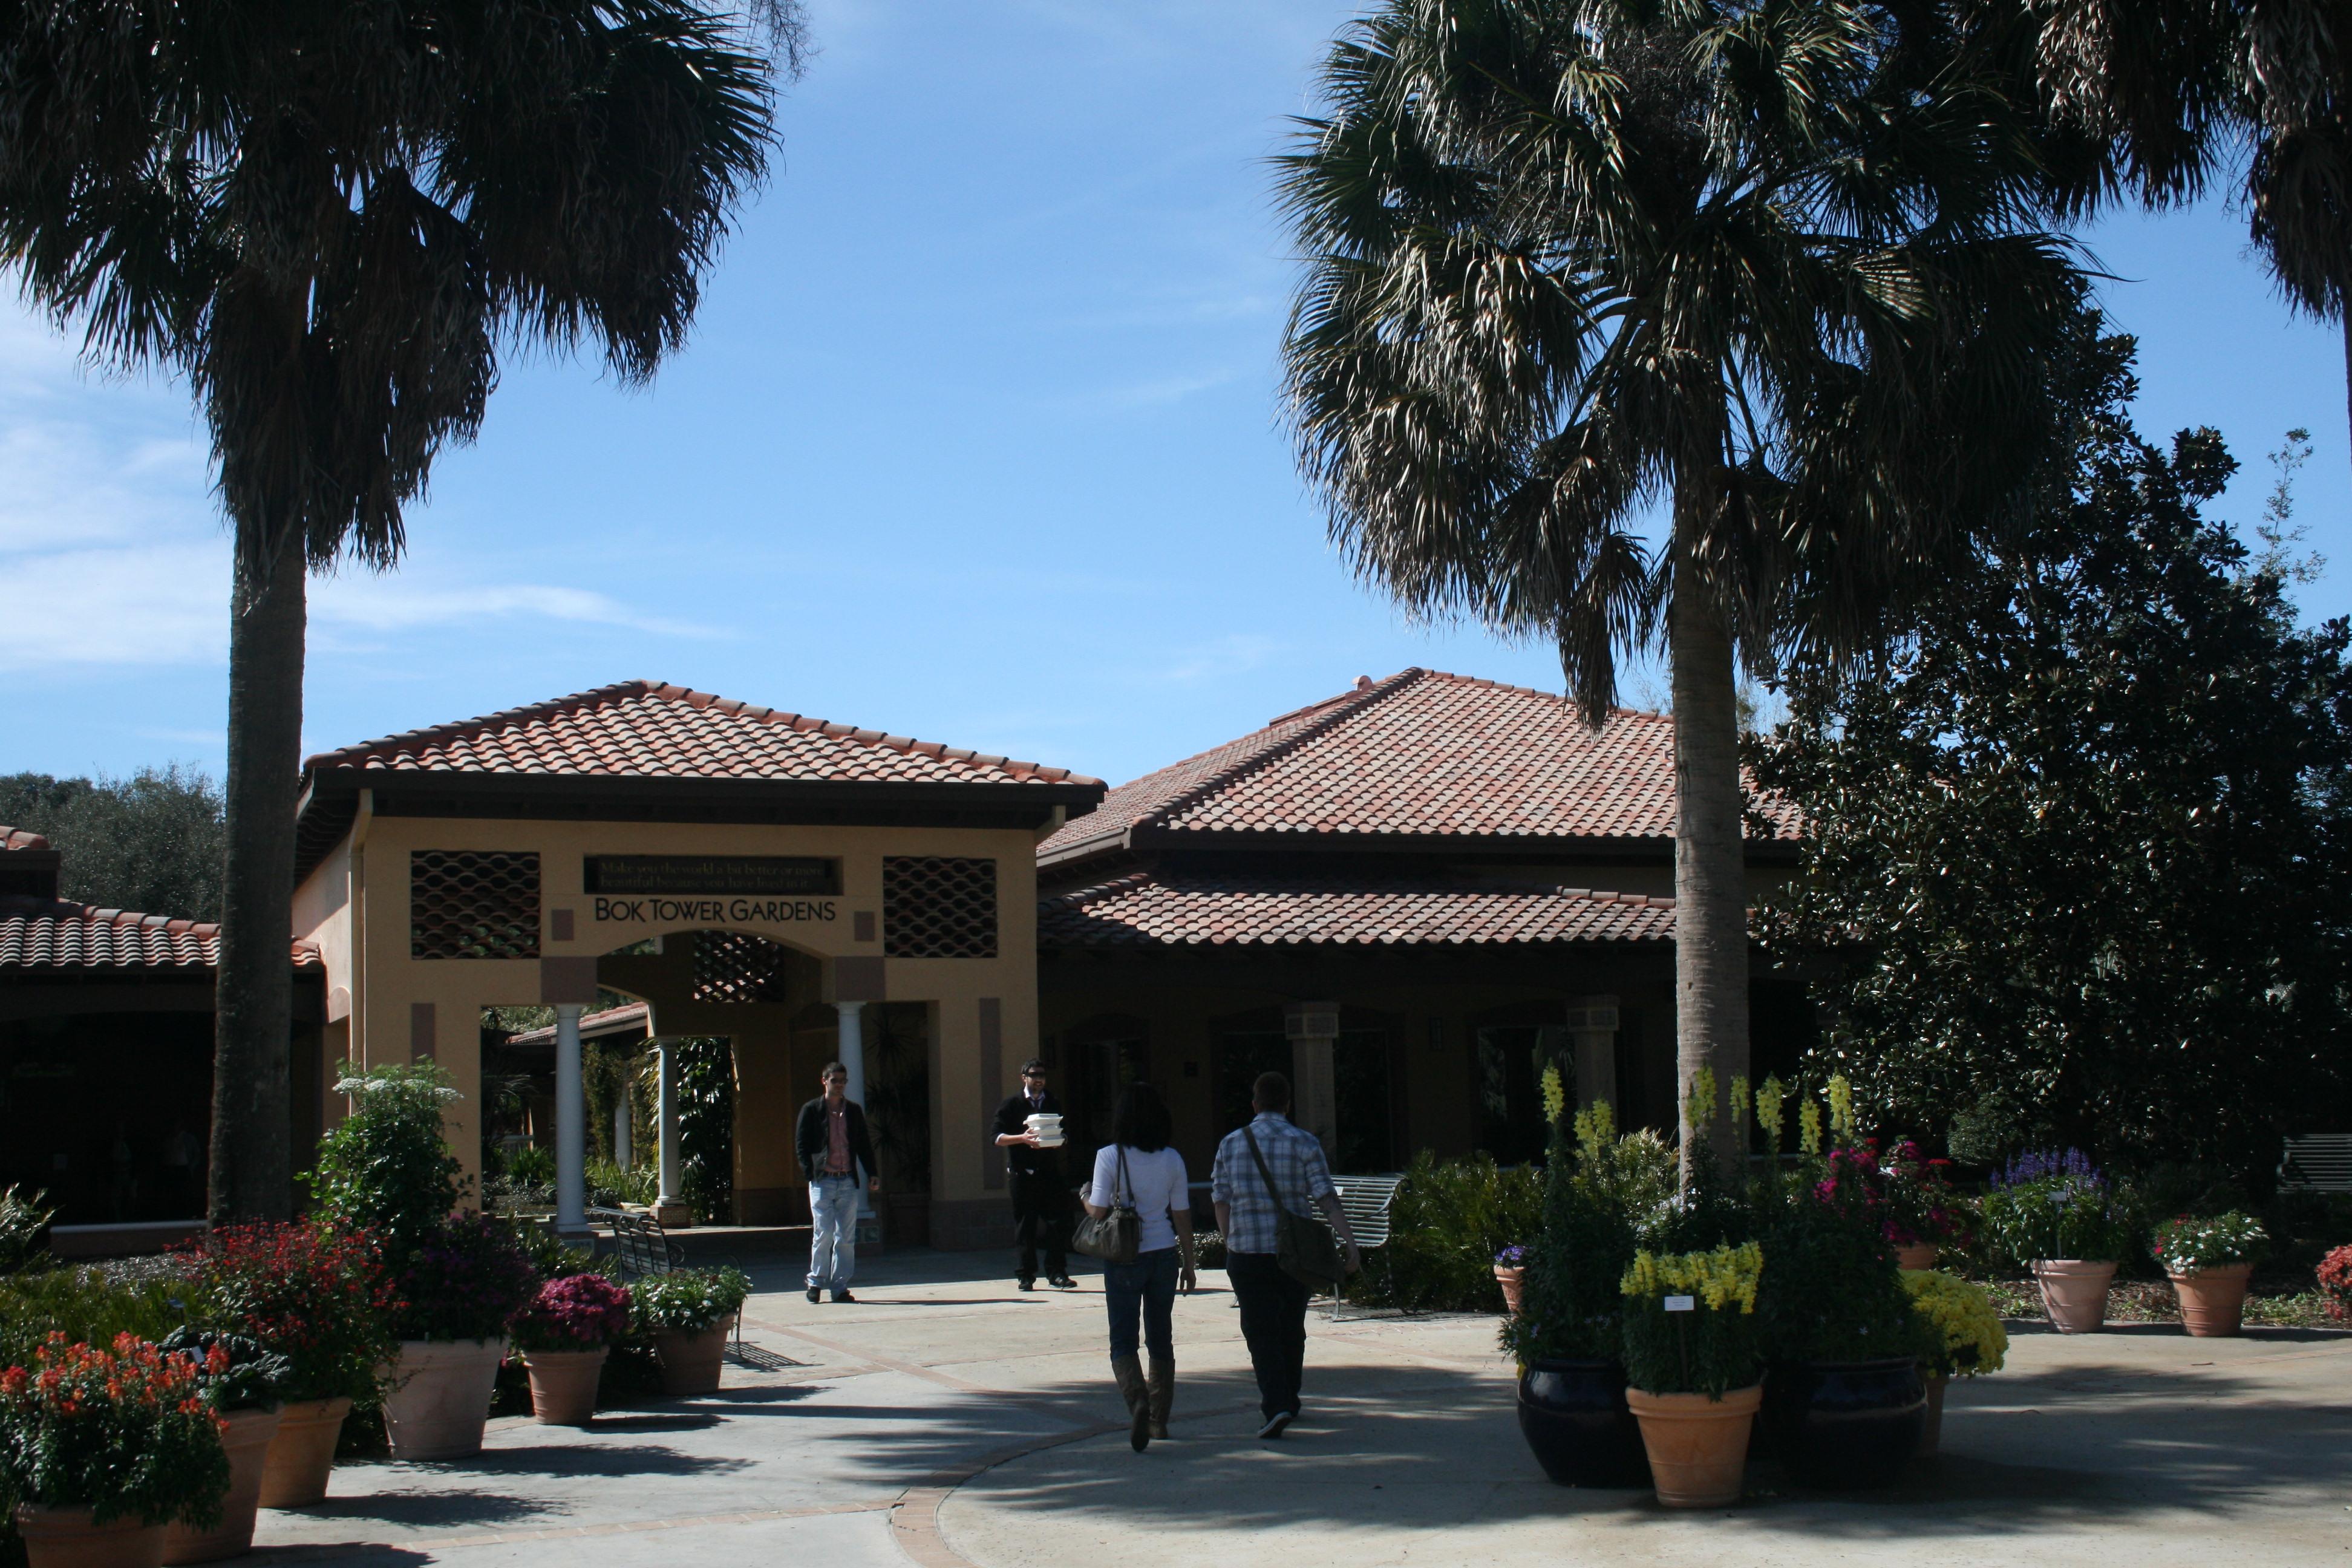 Bok Tower Gardens Visitor Center RICHES of Central Florida